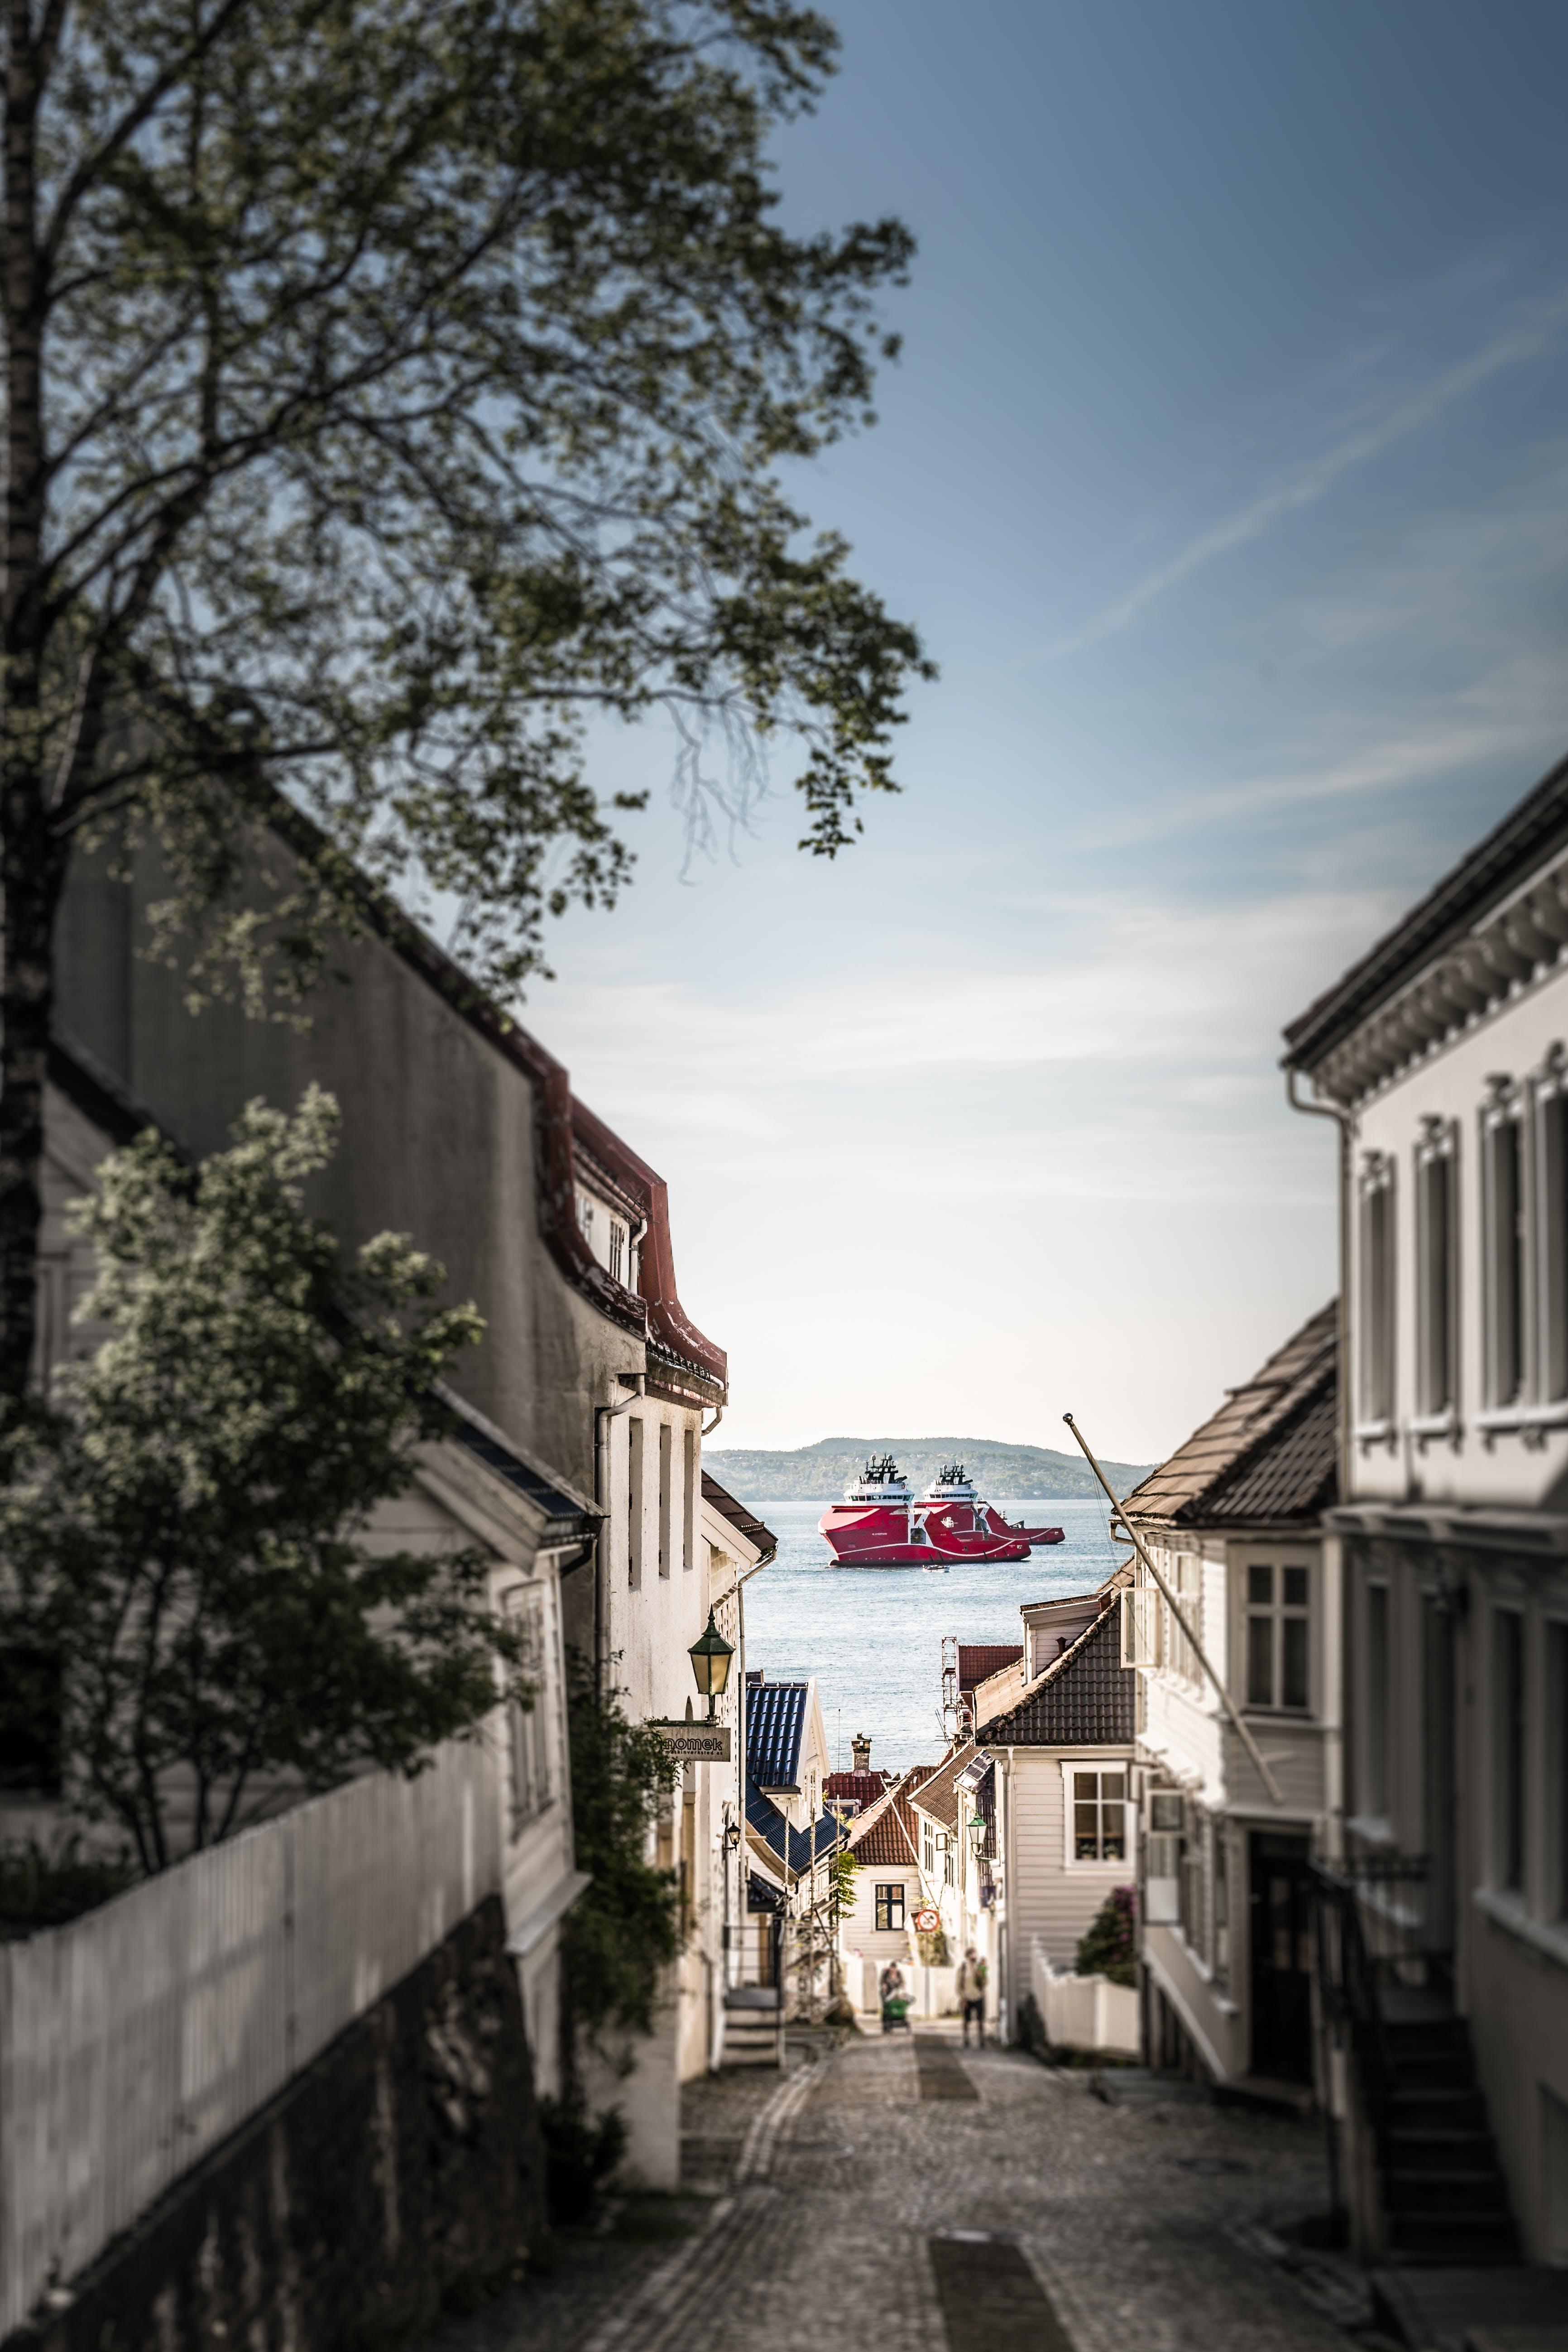 Kostenloses Stock Foto zu bergen, bergen norwegen, blau, blauer himmel